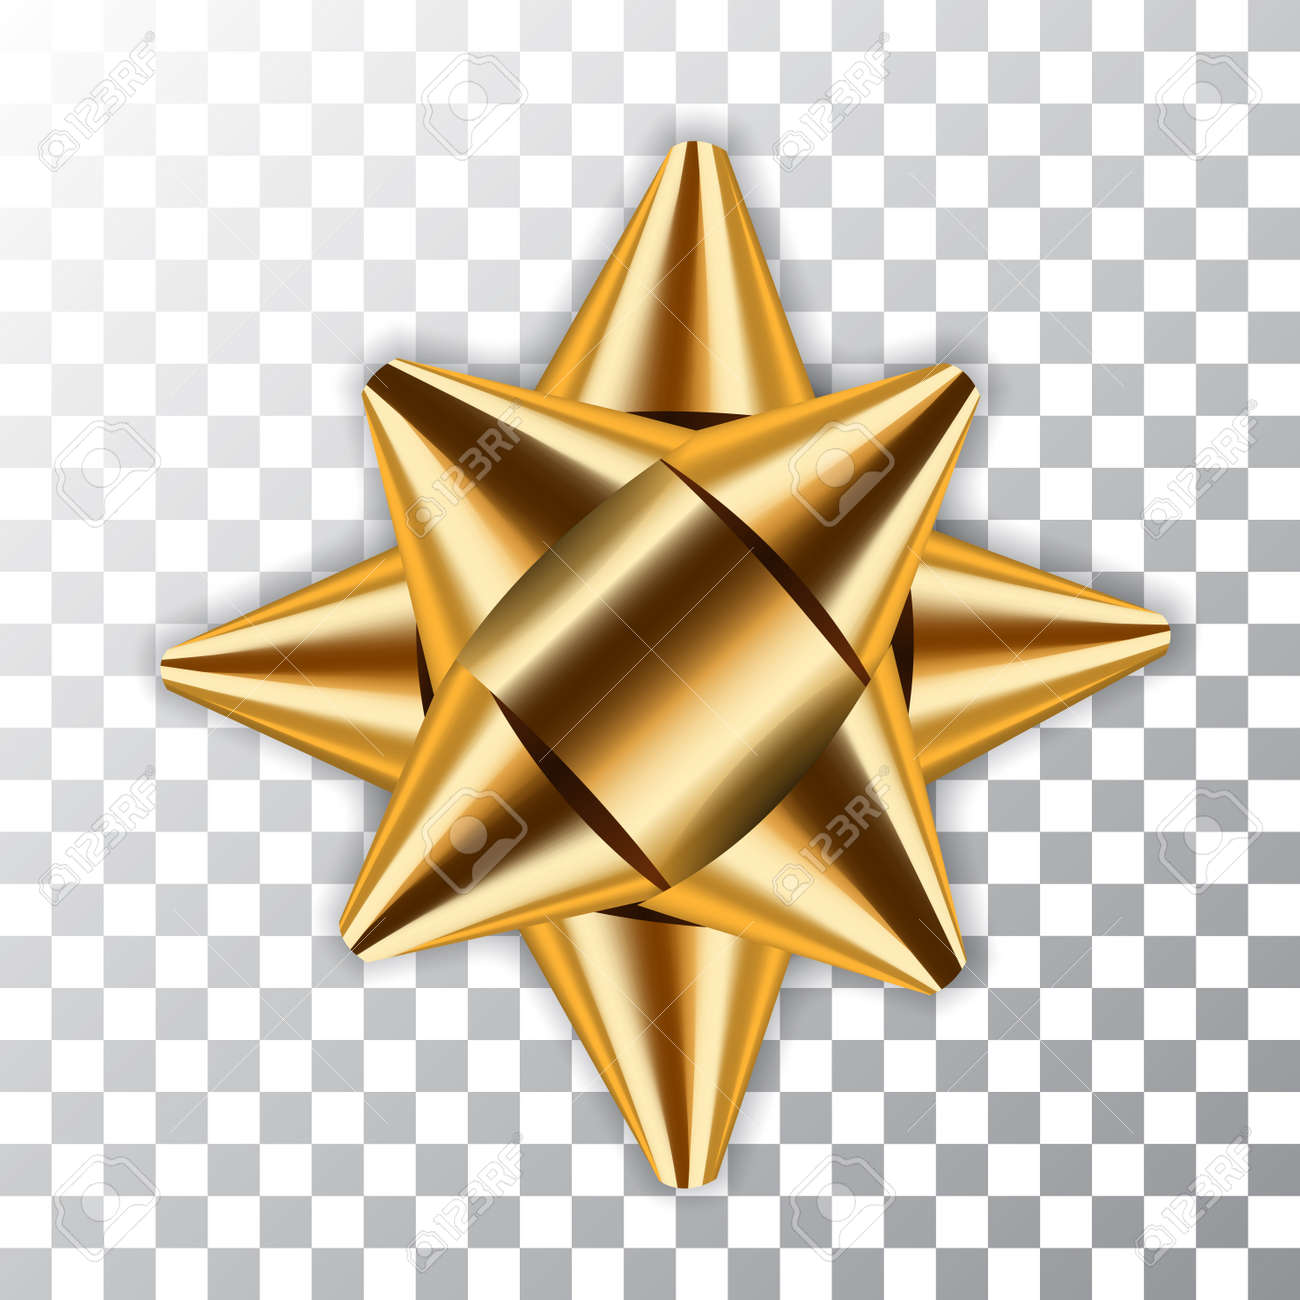 Gold bow ribbon decor element package. Shiny golden satin decoration gift present, isolated white transparent background. Christmas, New Year holiday celebration design Vector illustration - 85354265